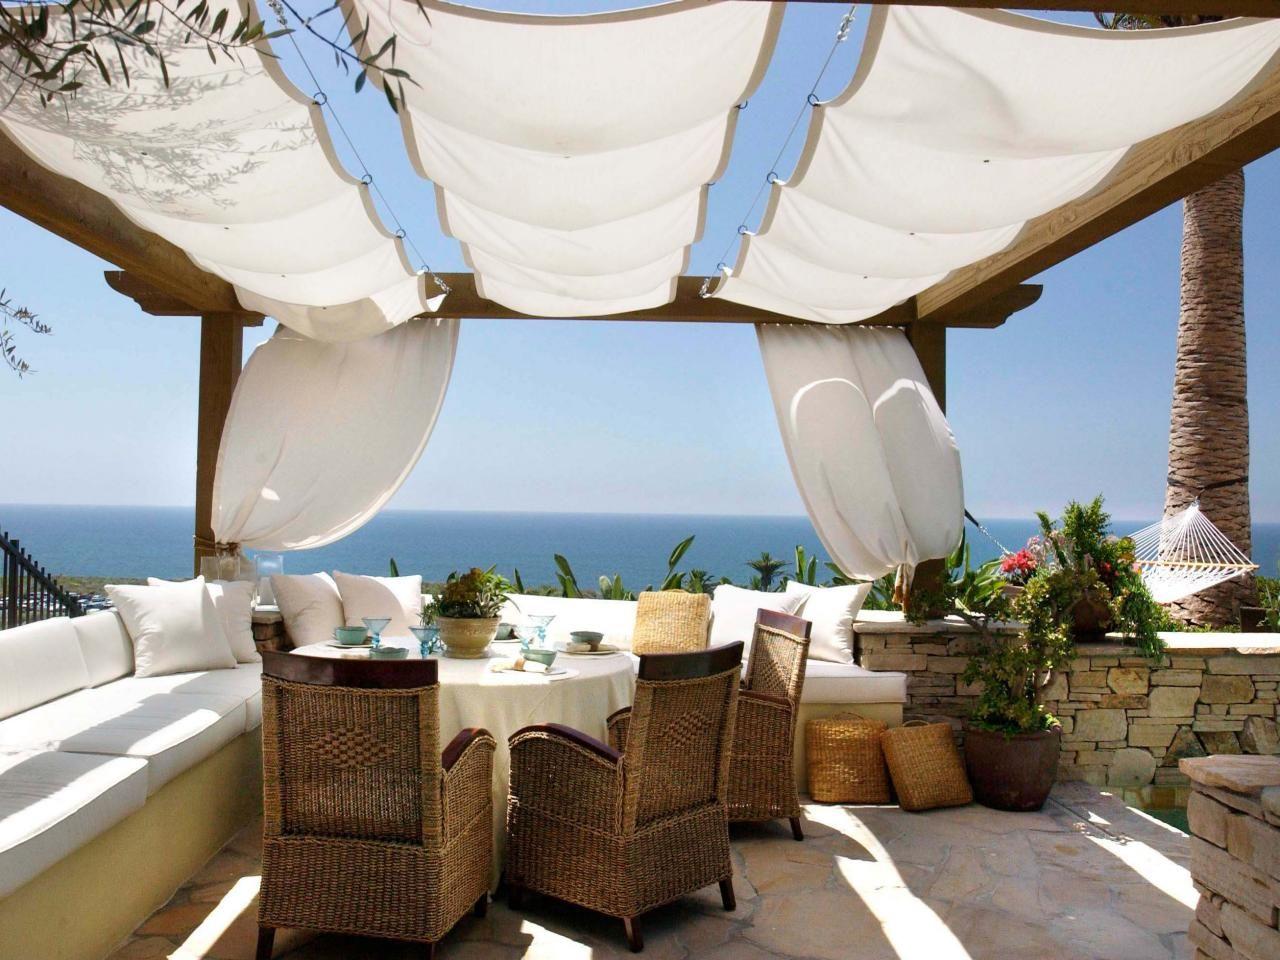 Images of 20 Beautiful Patio Designs | Outdoor Design - Landscaping Ideas, Porches, Decks, & Patios | HGTV